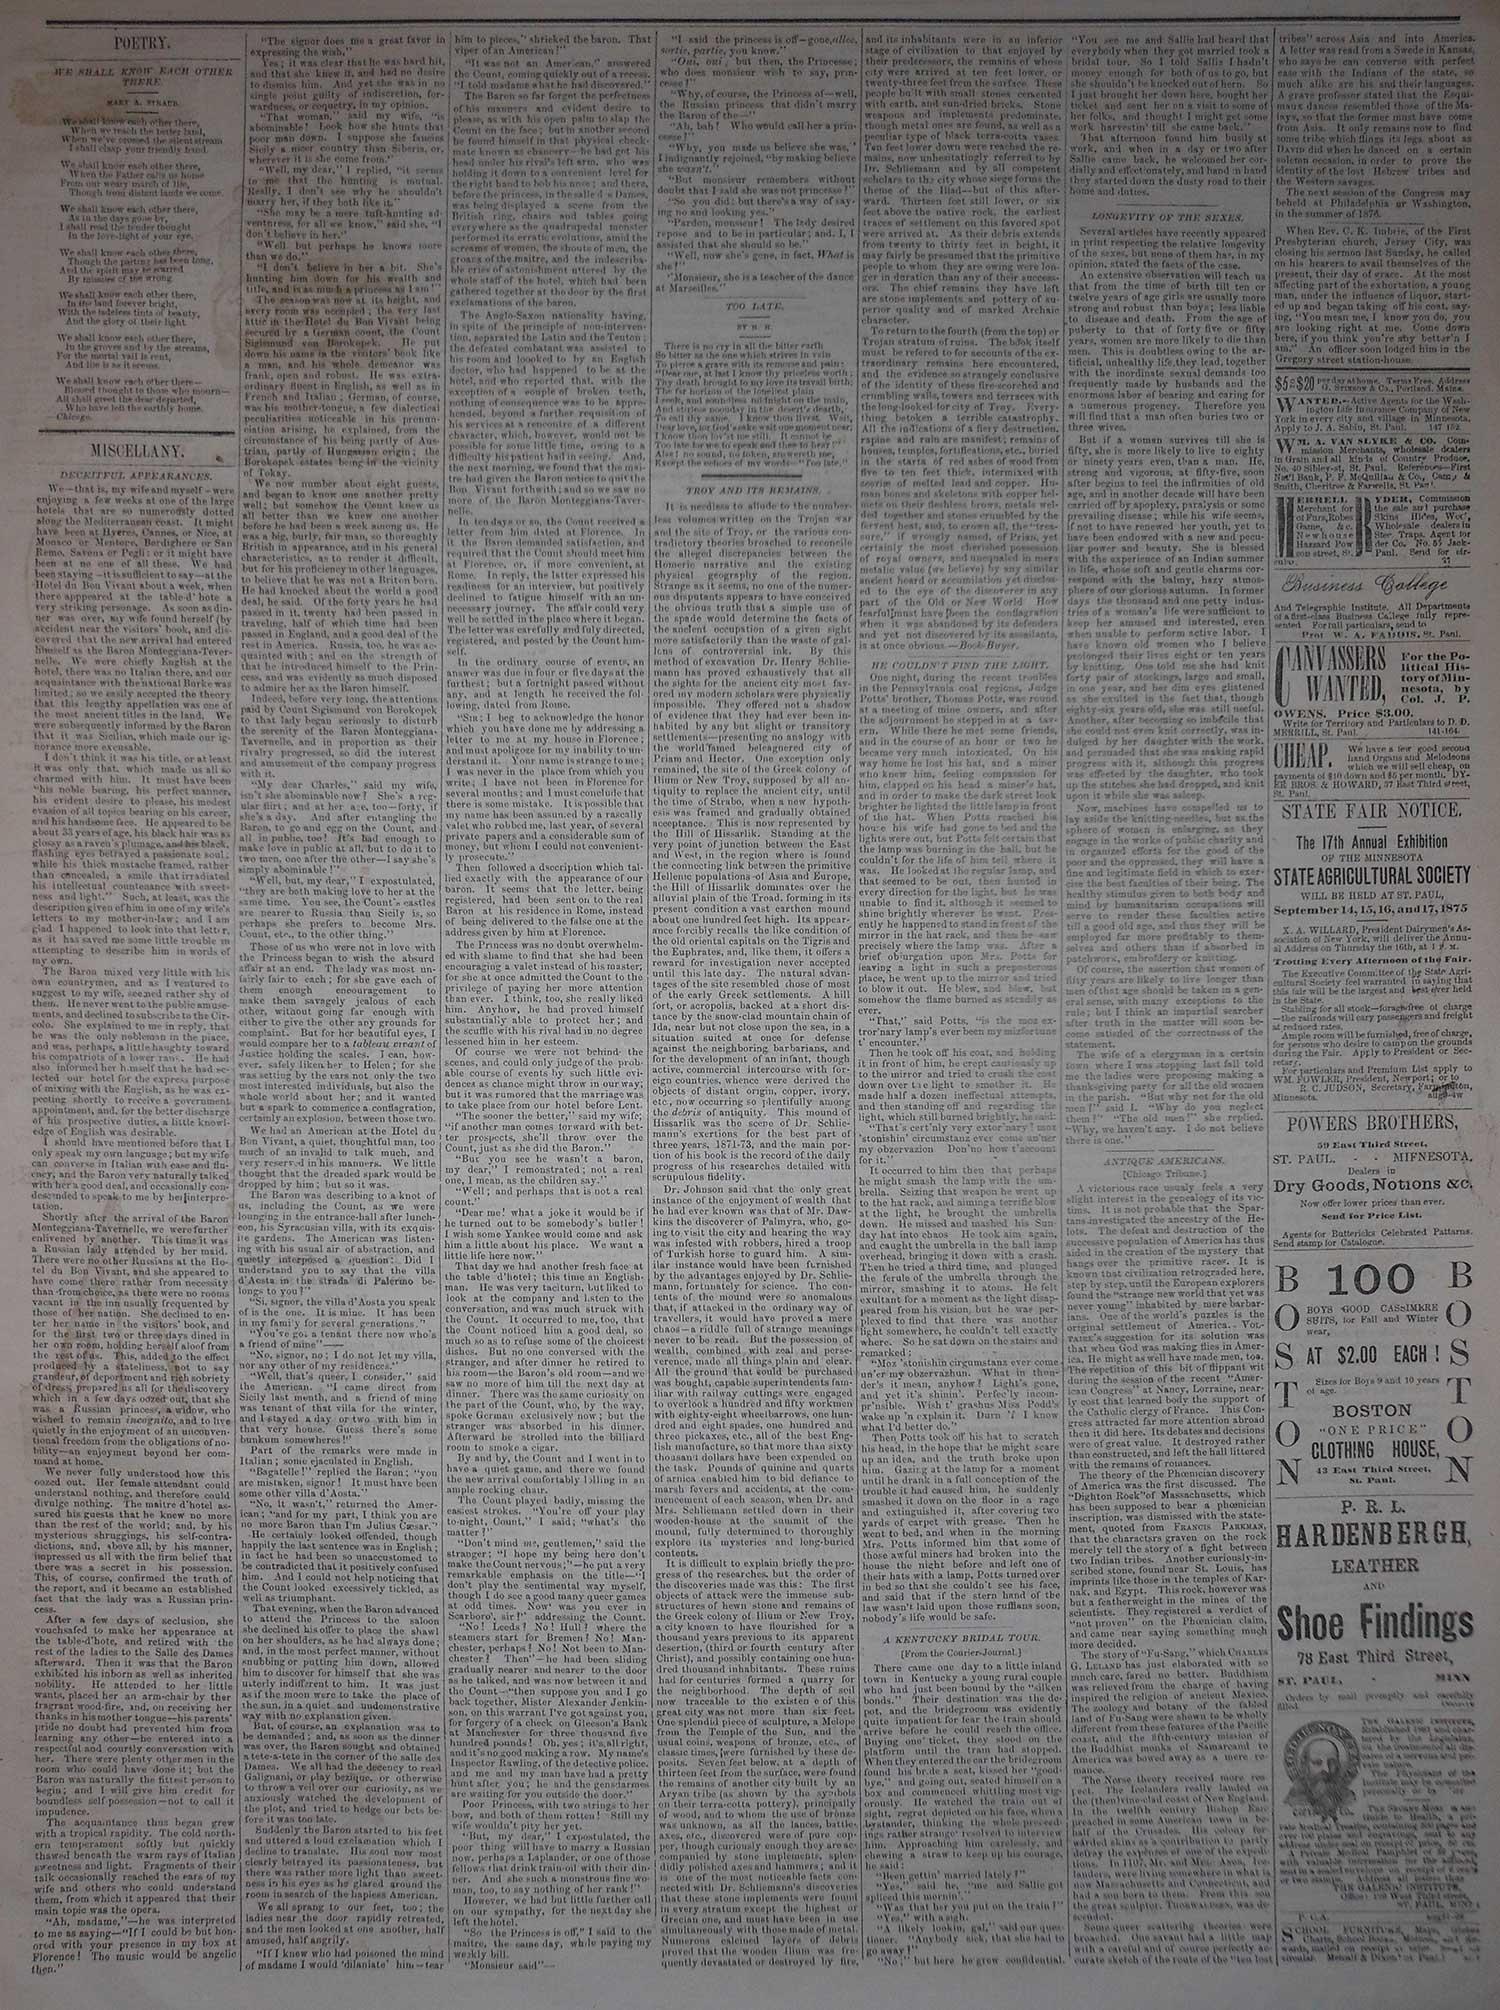 9/1/1875, p3